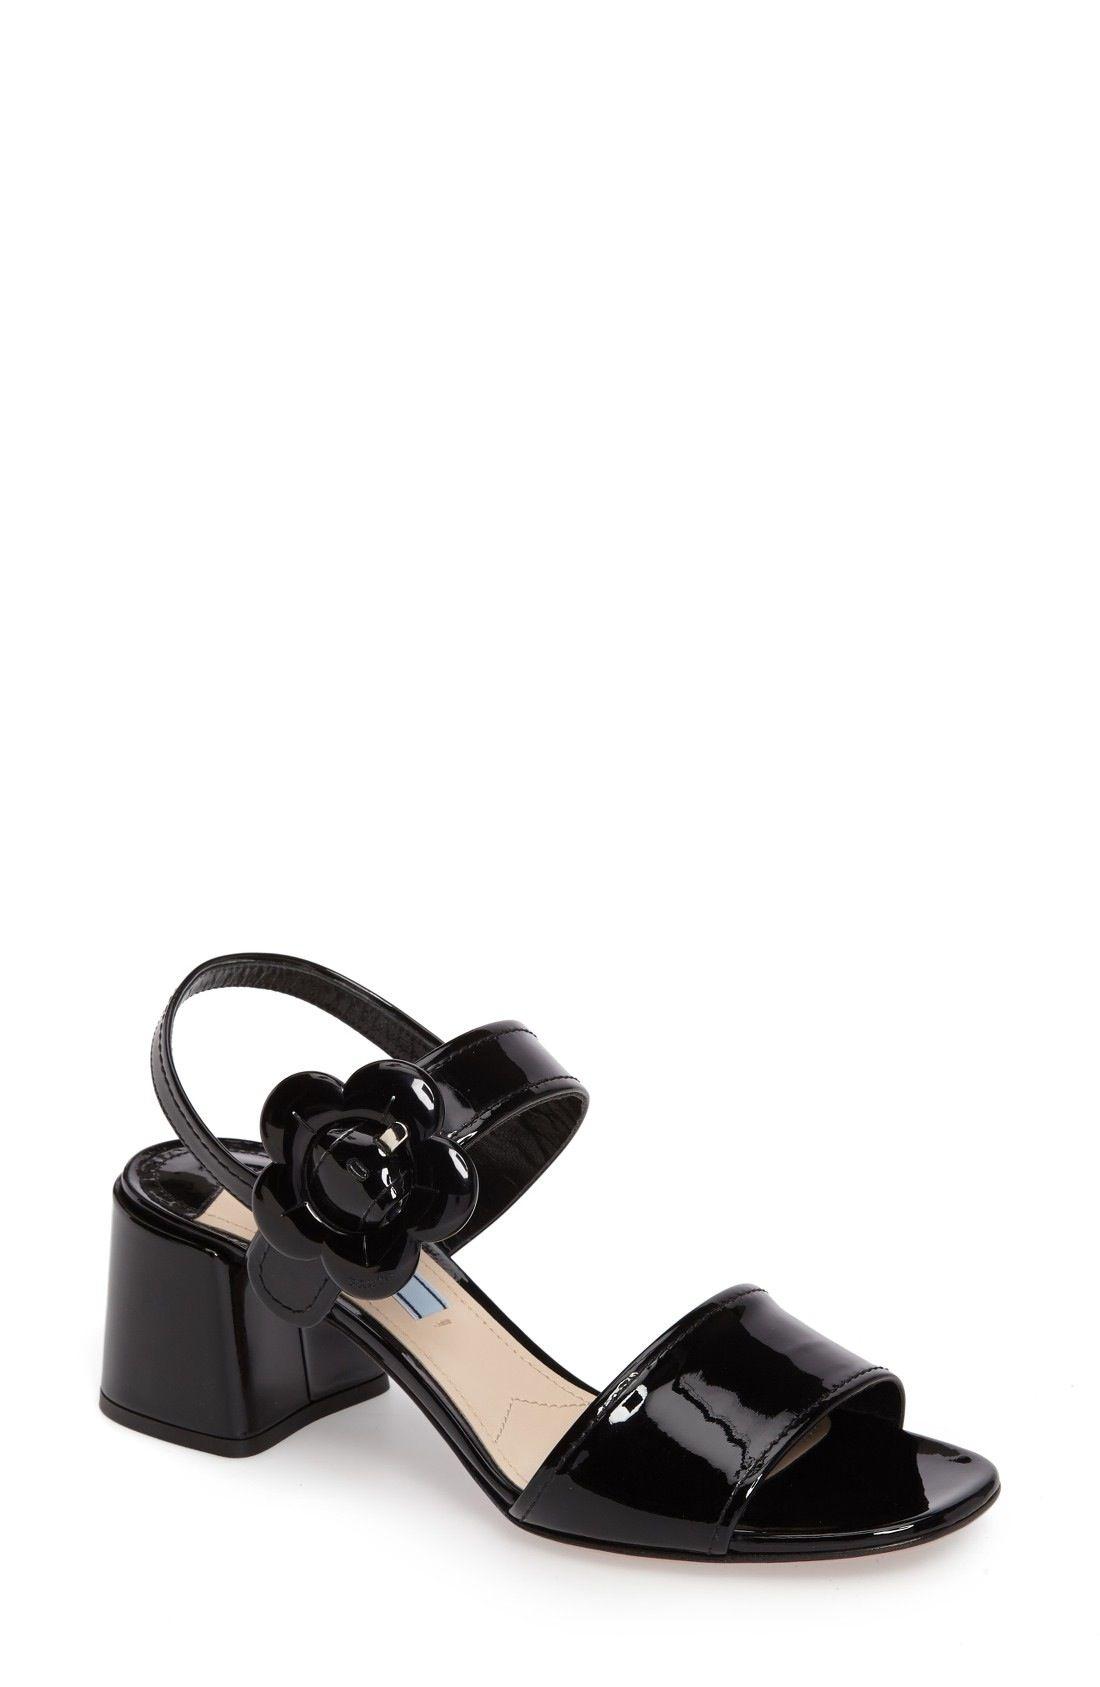 ab6336d98cc5 Prada Flower Buckle Sandal (Women) available at  Nordstrom